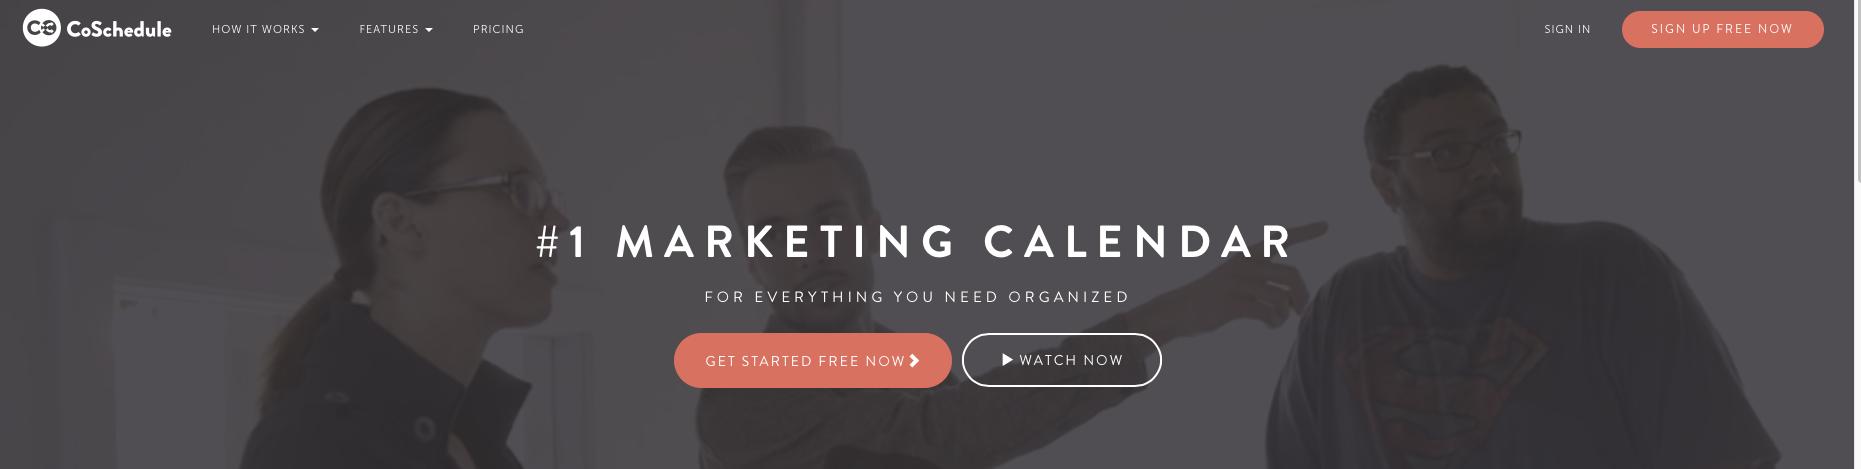 Подходит ли контент-маркетинг малому бизнесу?